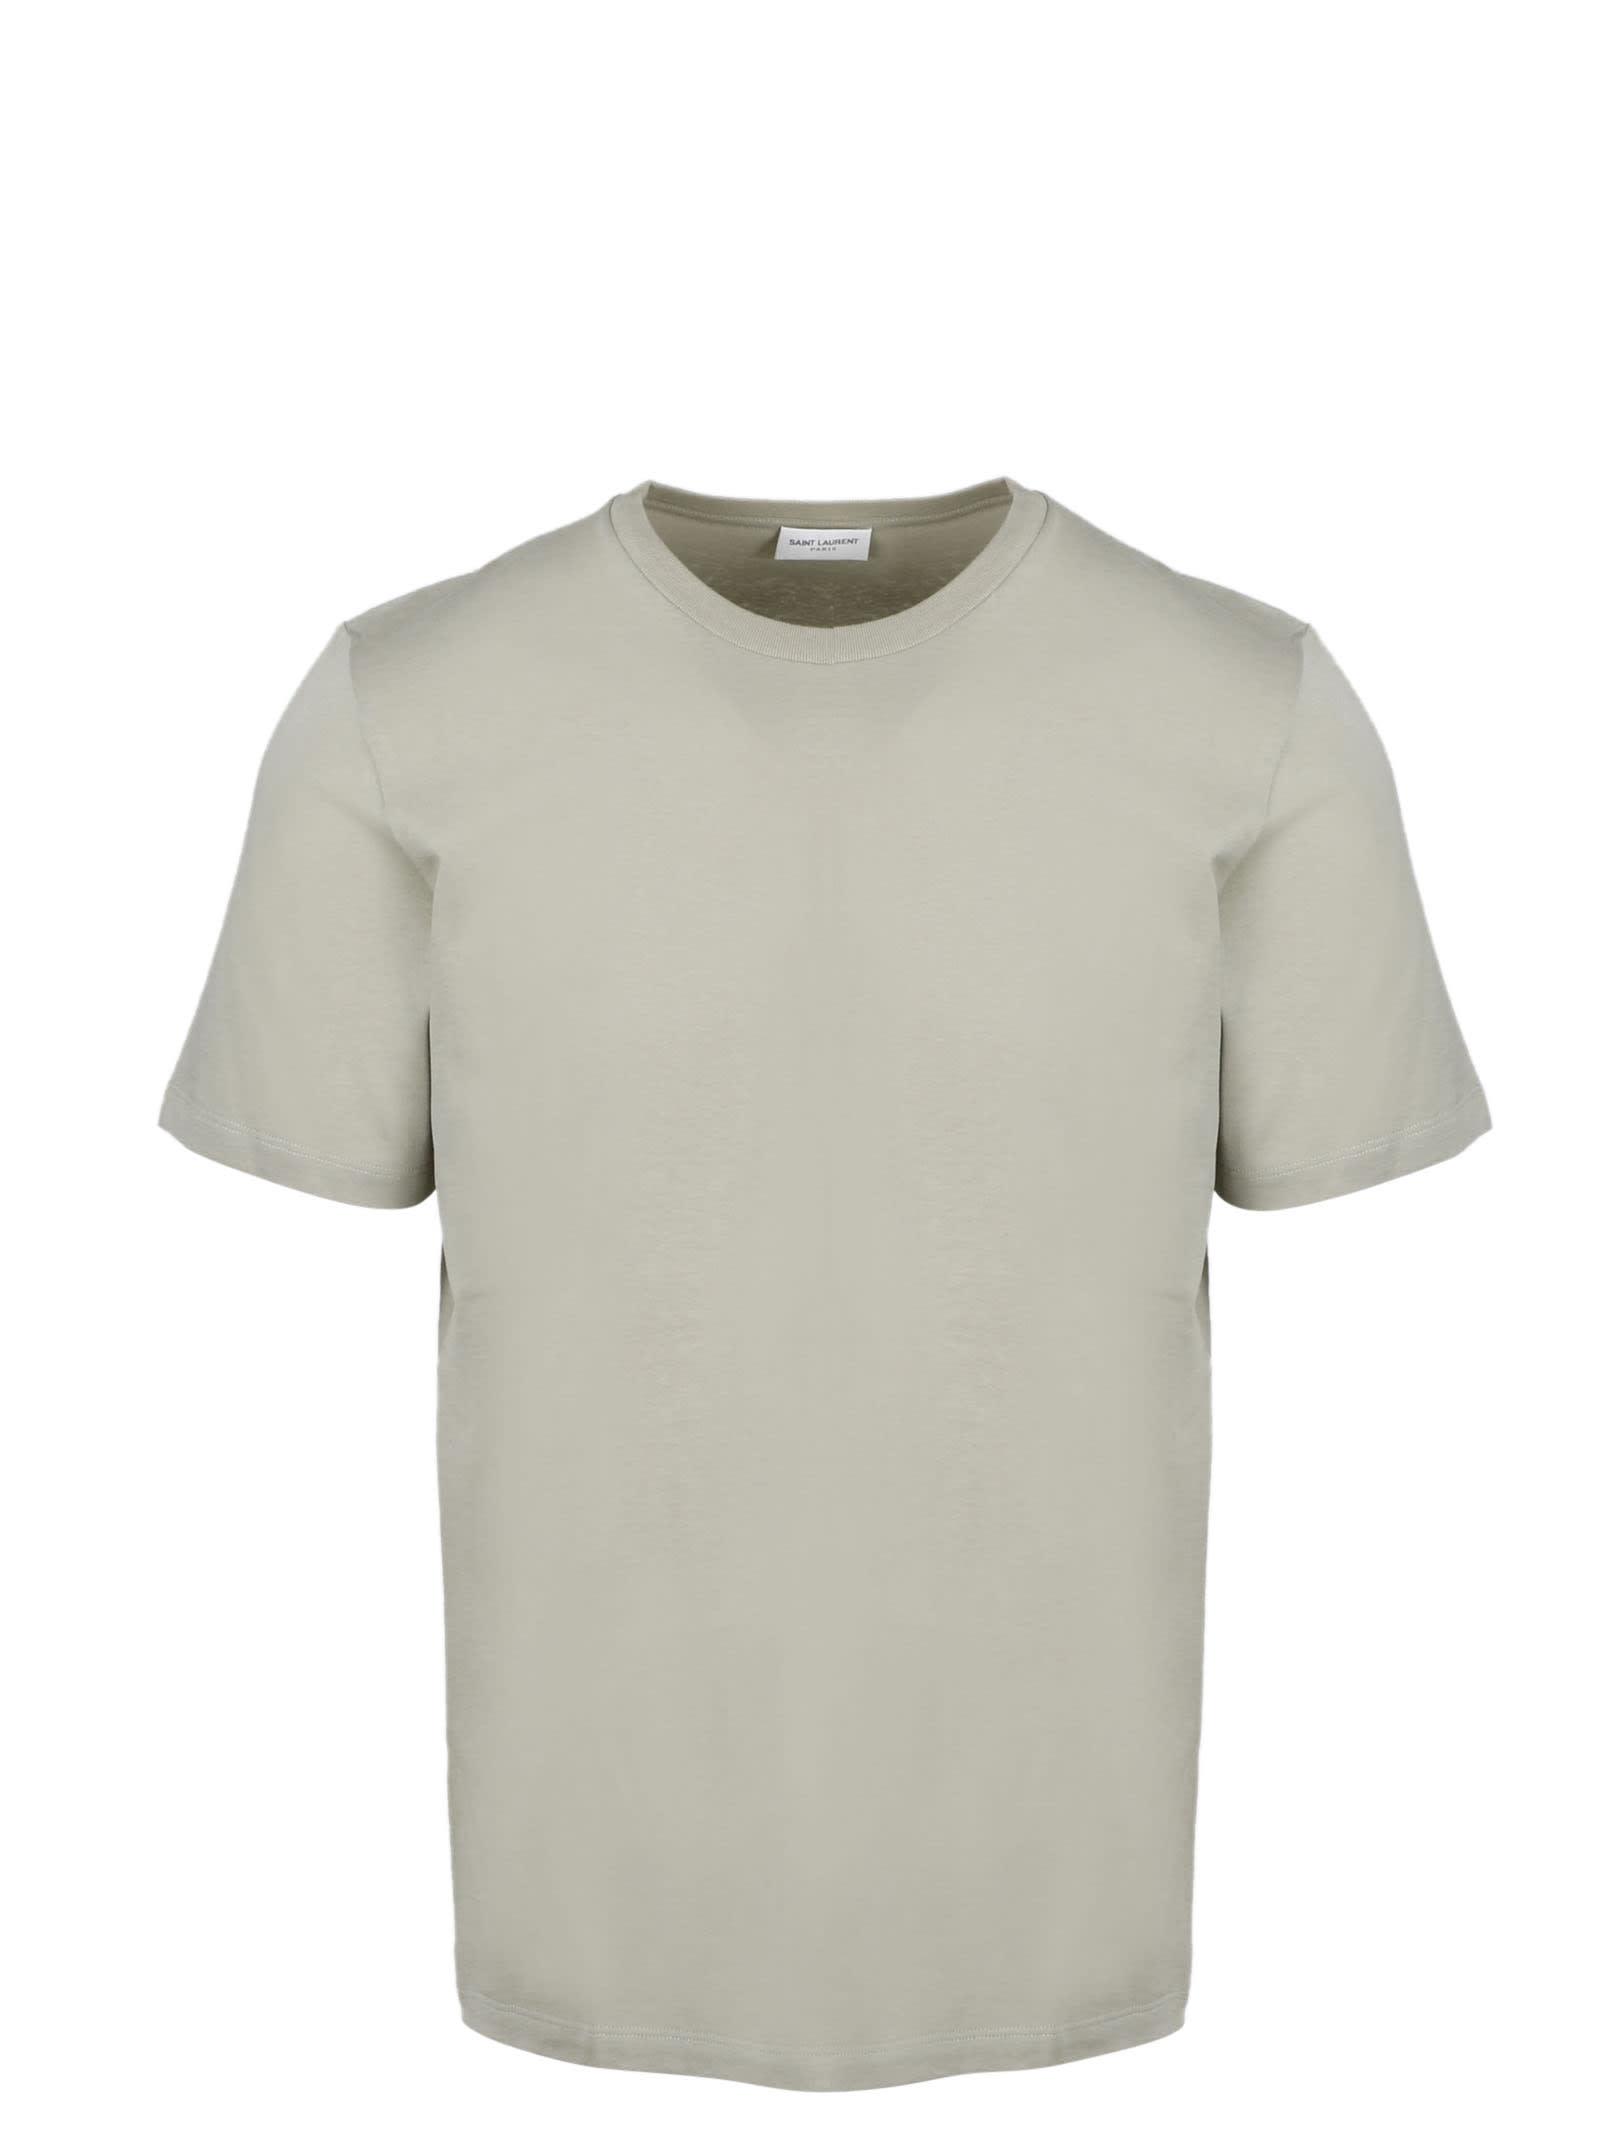 Saint Laurent Monogram T-shirt